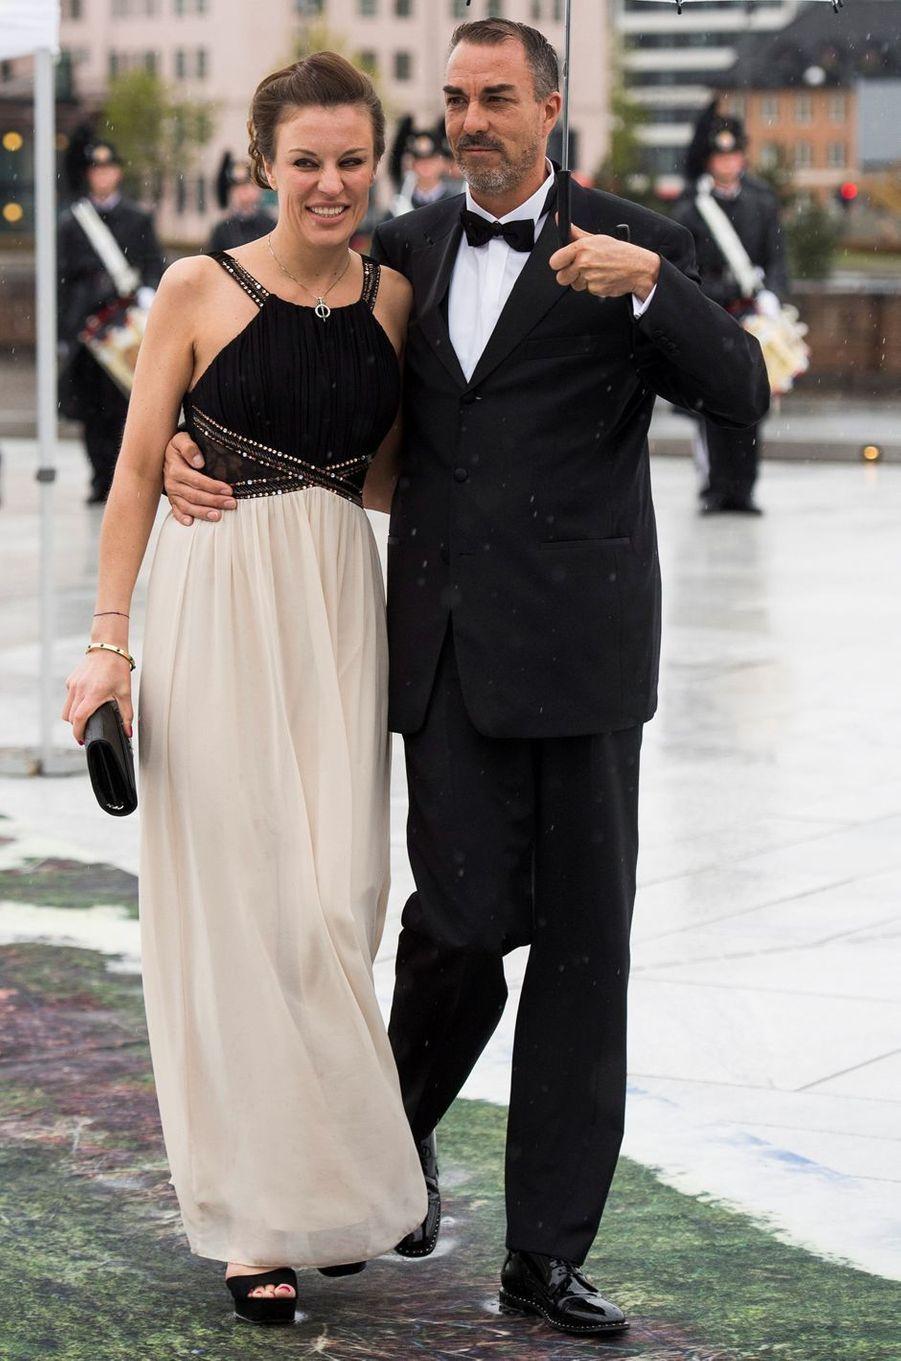 Desiree Kogevinas et Carlos Eugster à Oslo, le 10 mai 2017